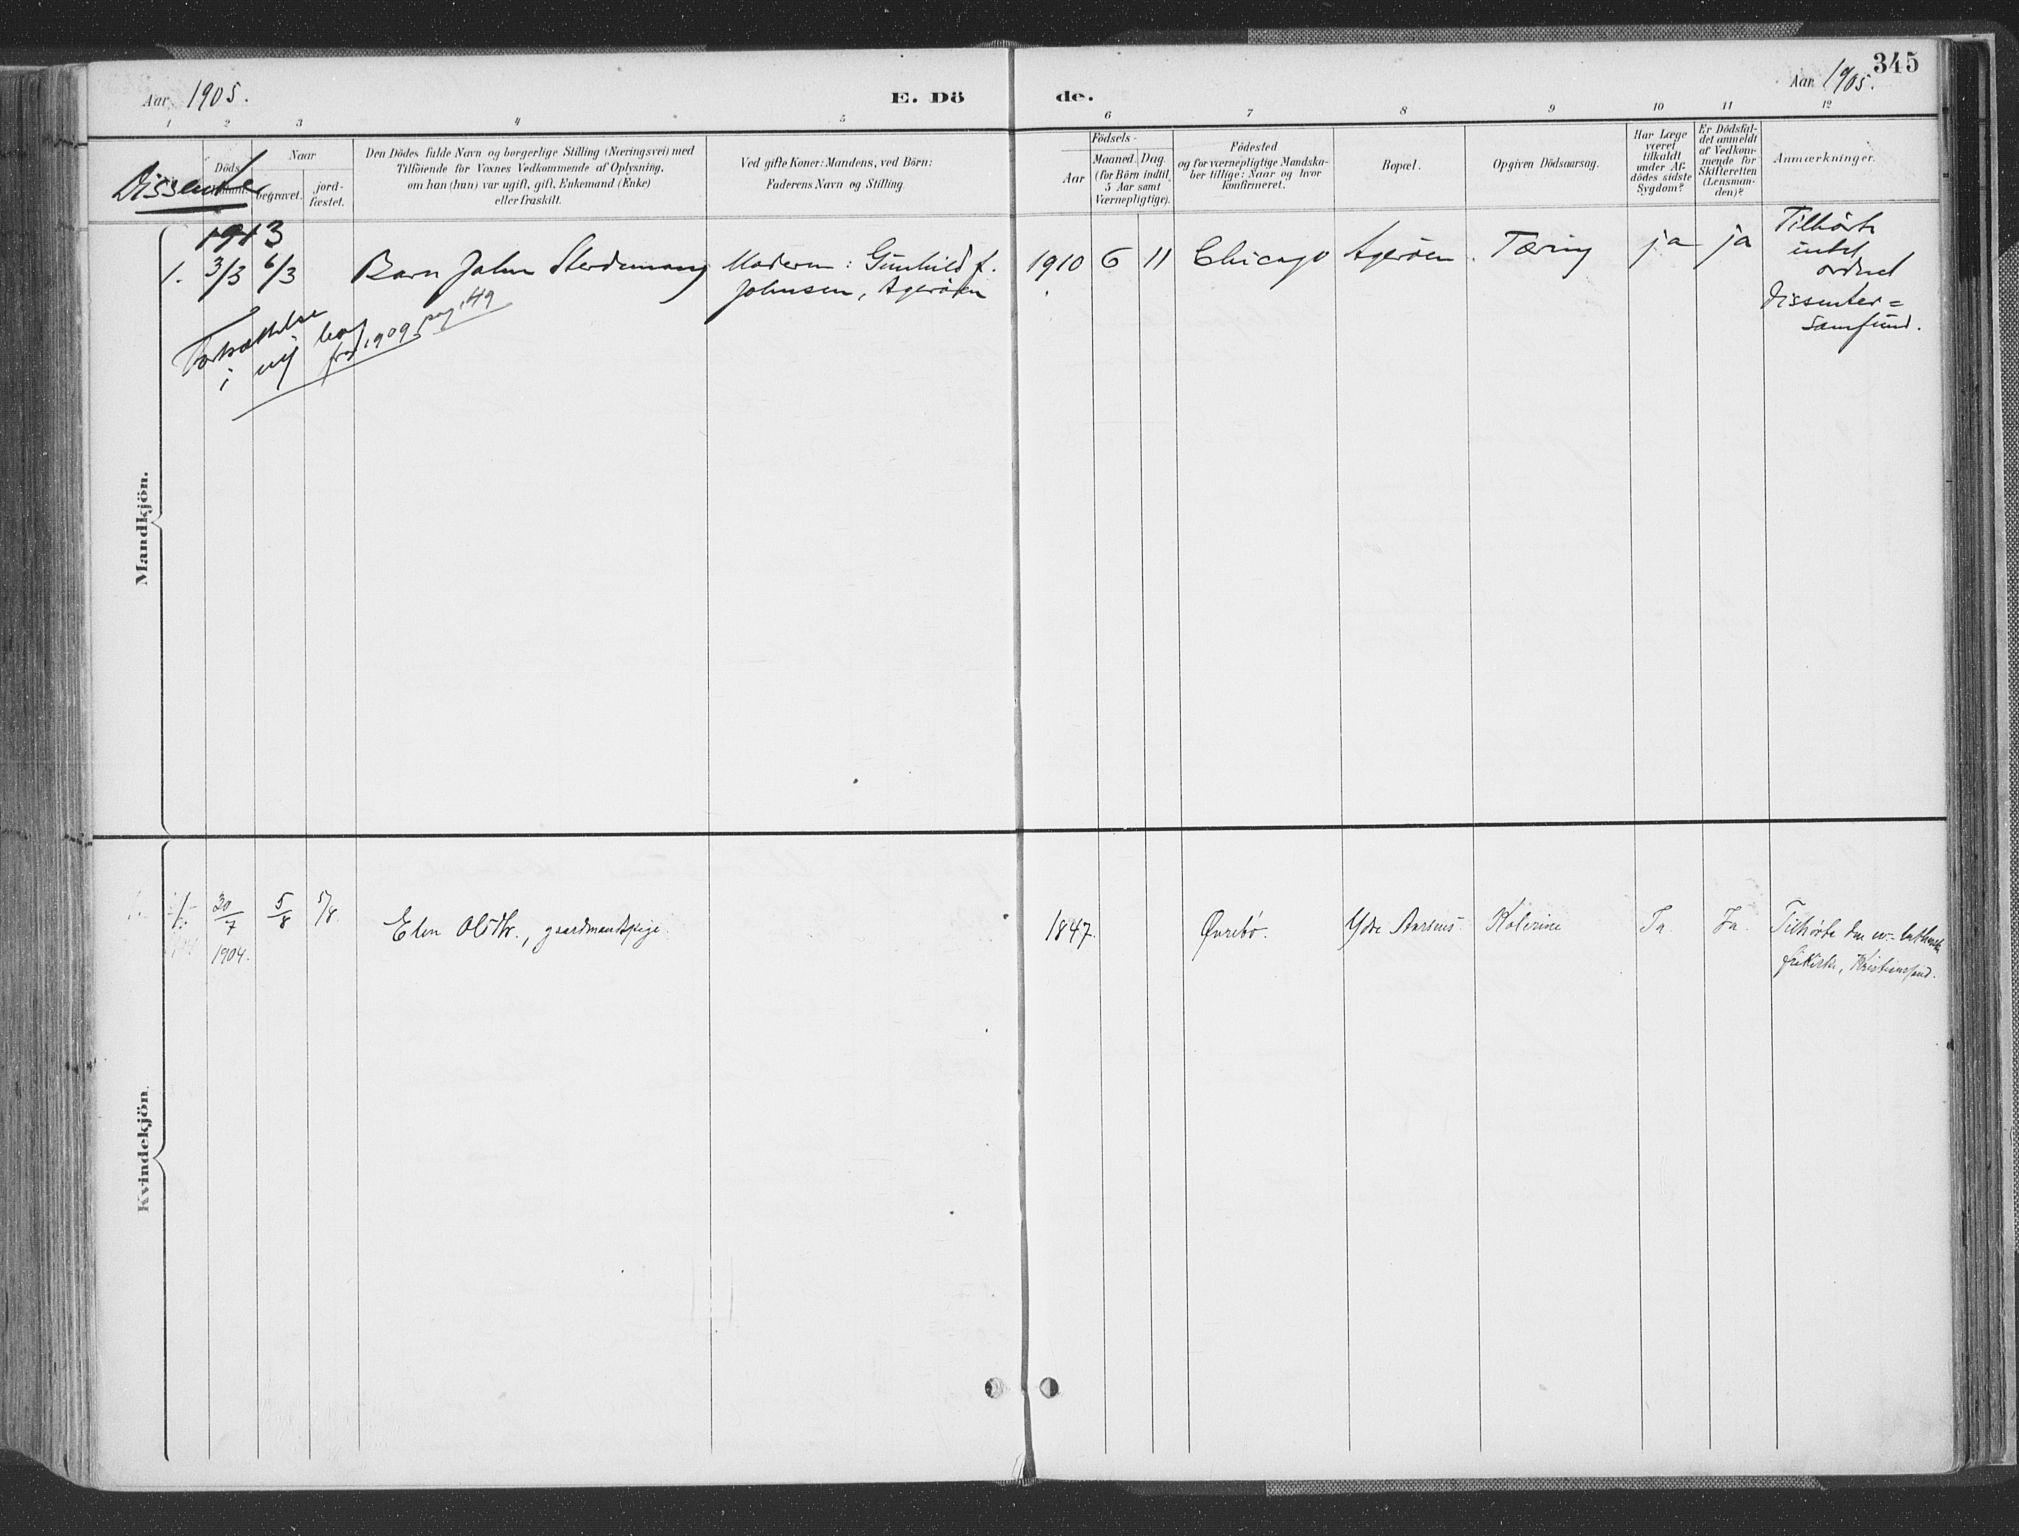 SAK, Høvåg sokneprestkontor, F/Fa/L0006: Ministerialbok nr. A 6, 1894-1923, s. 345